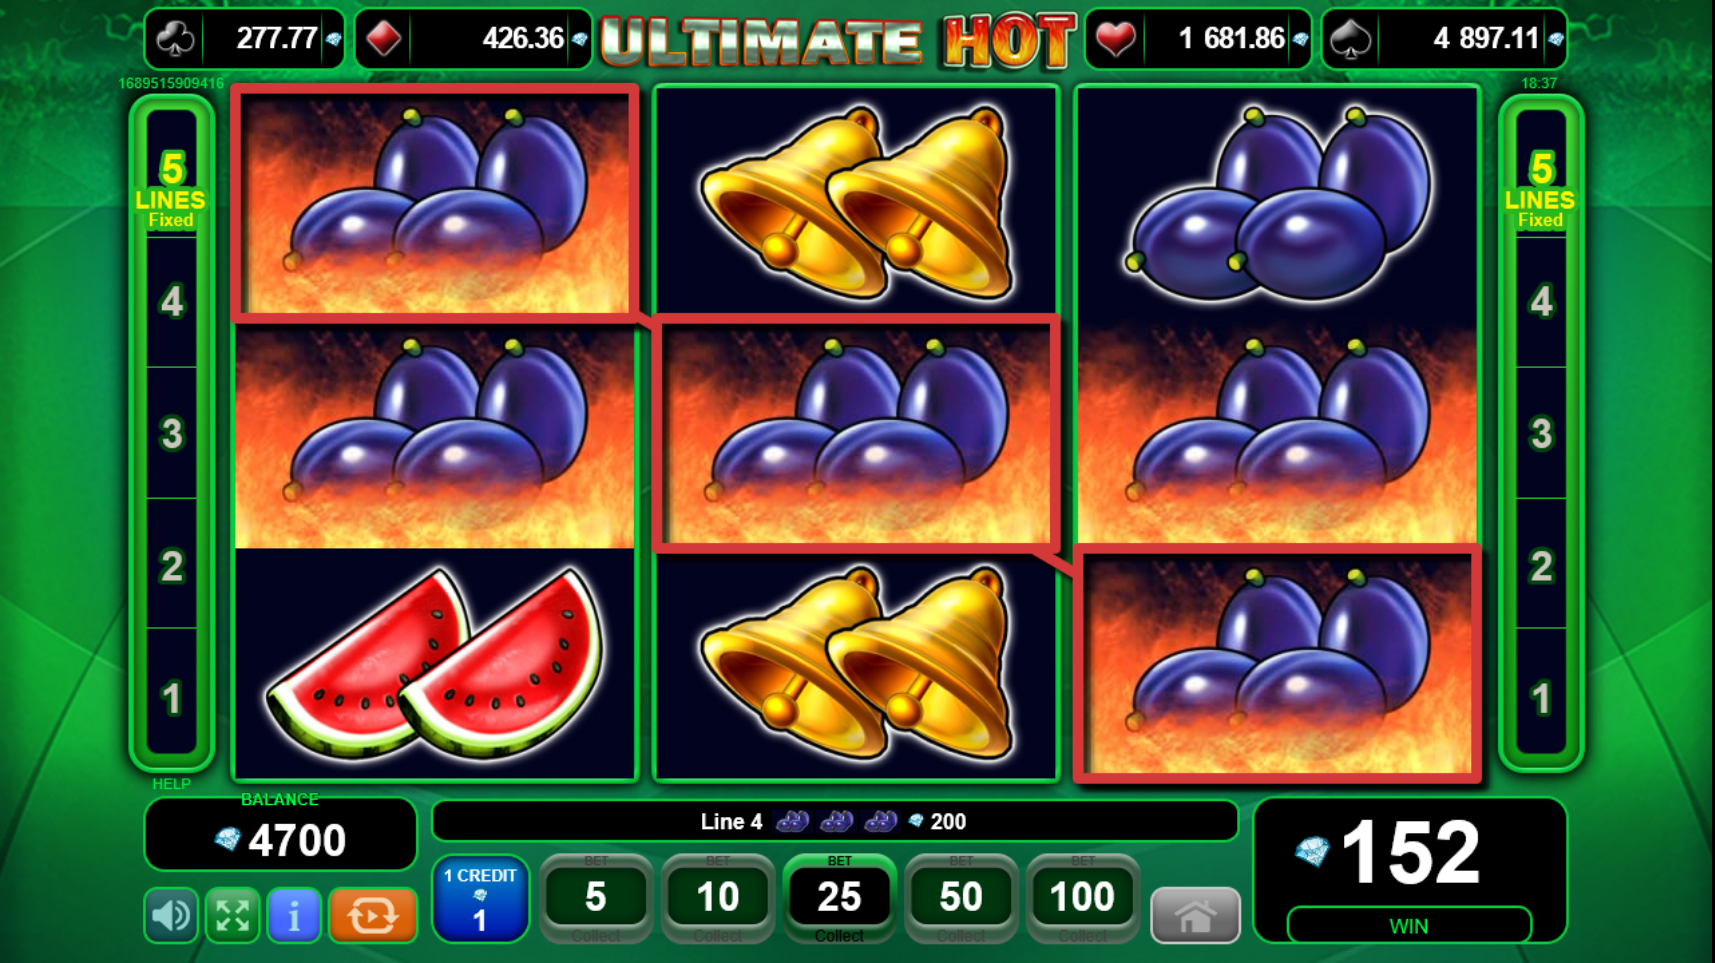 Afq poker